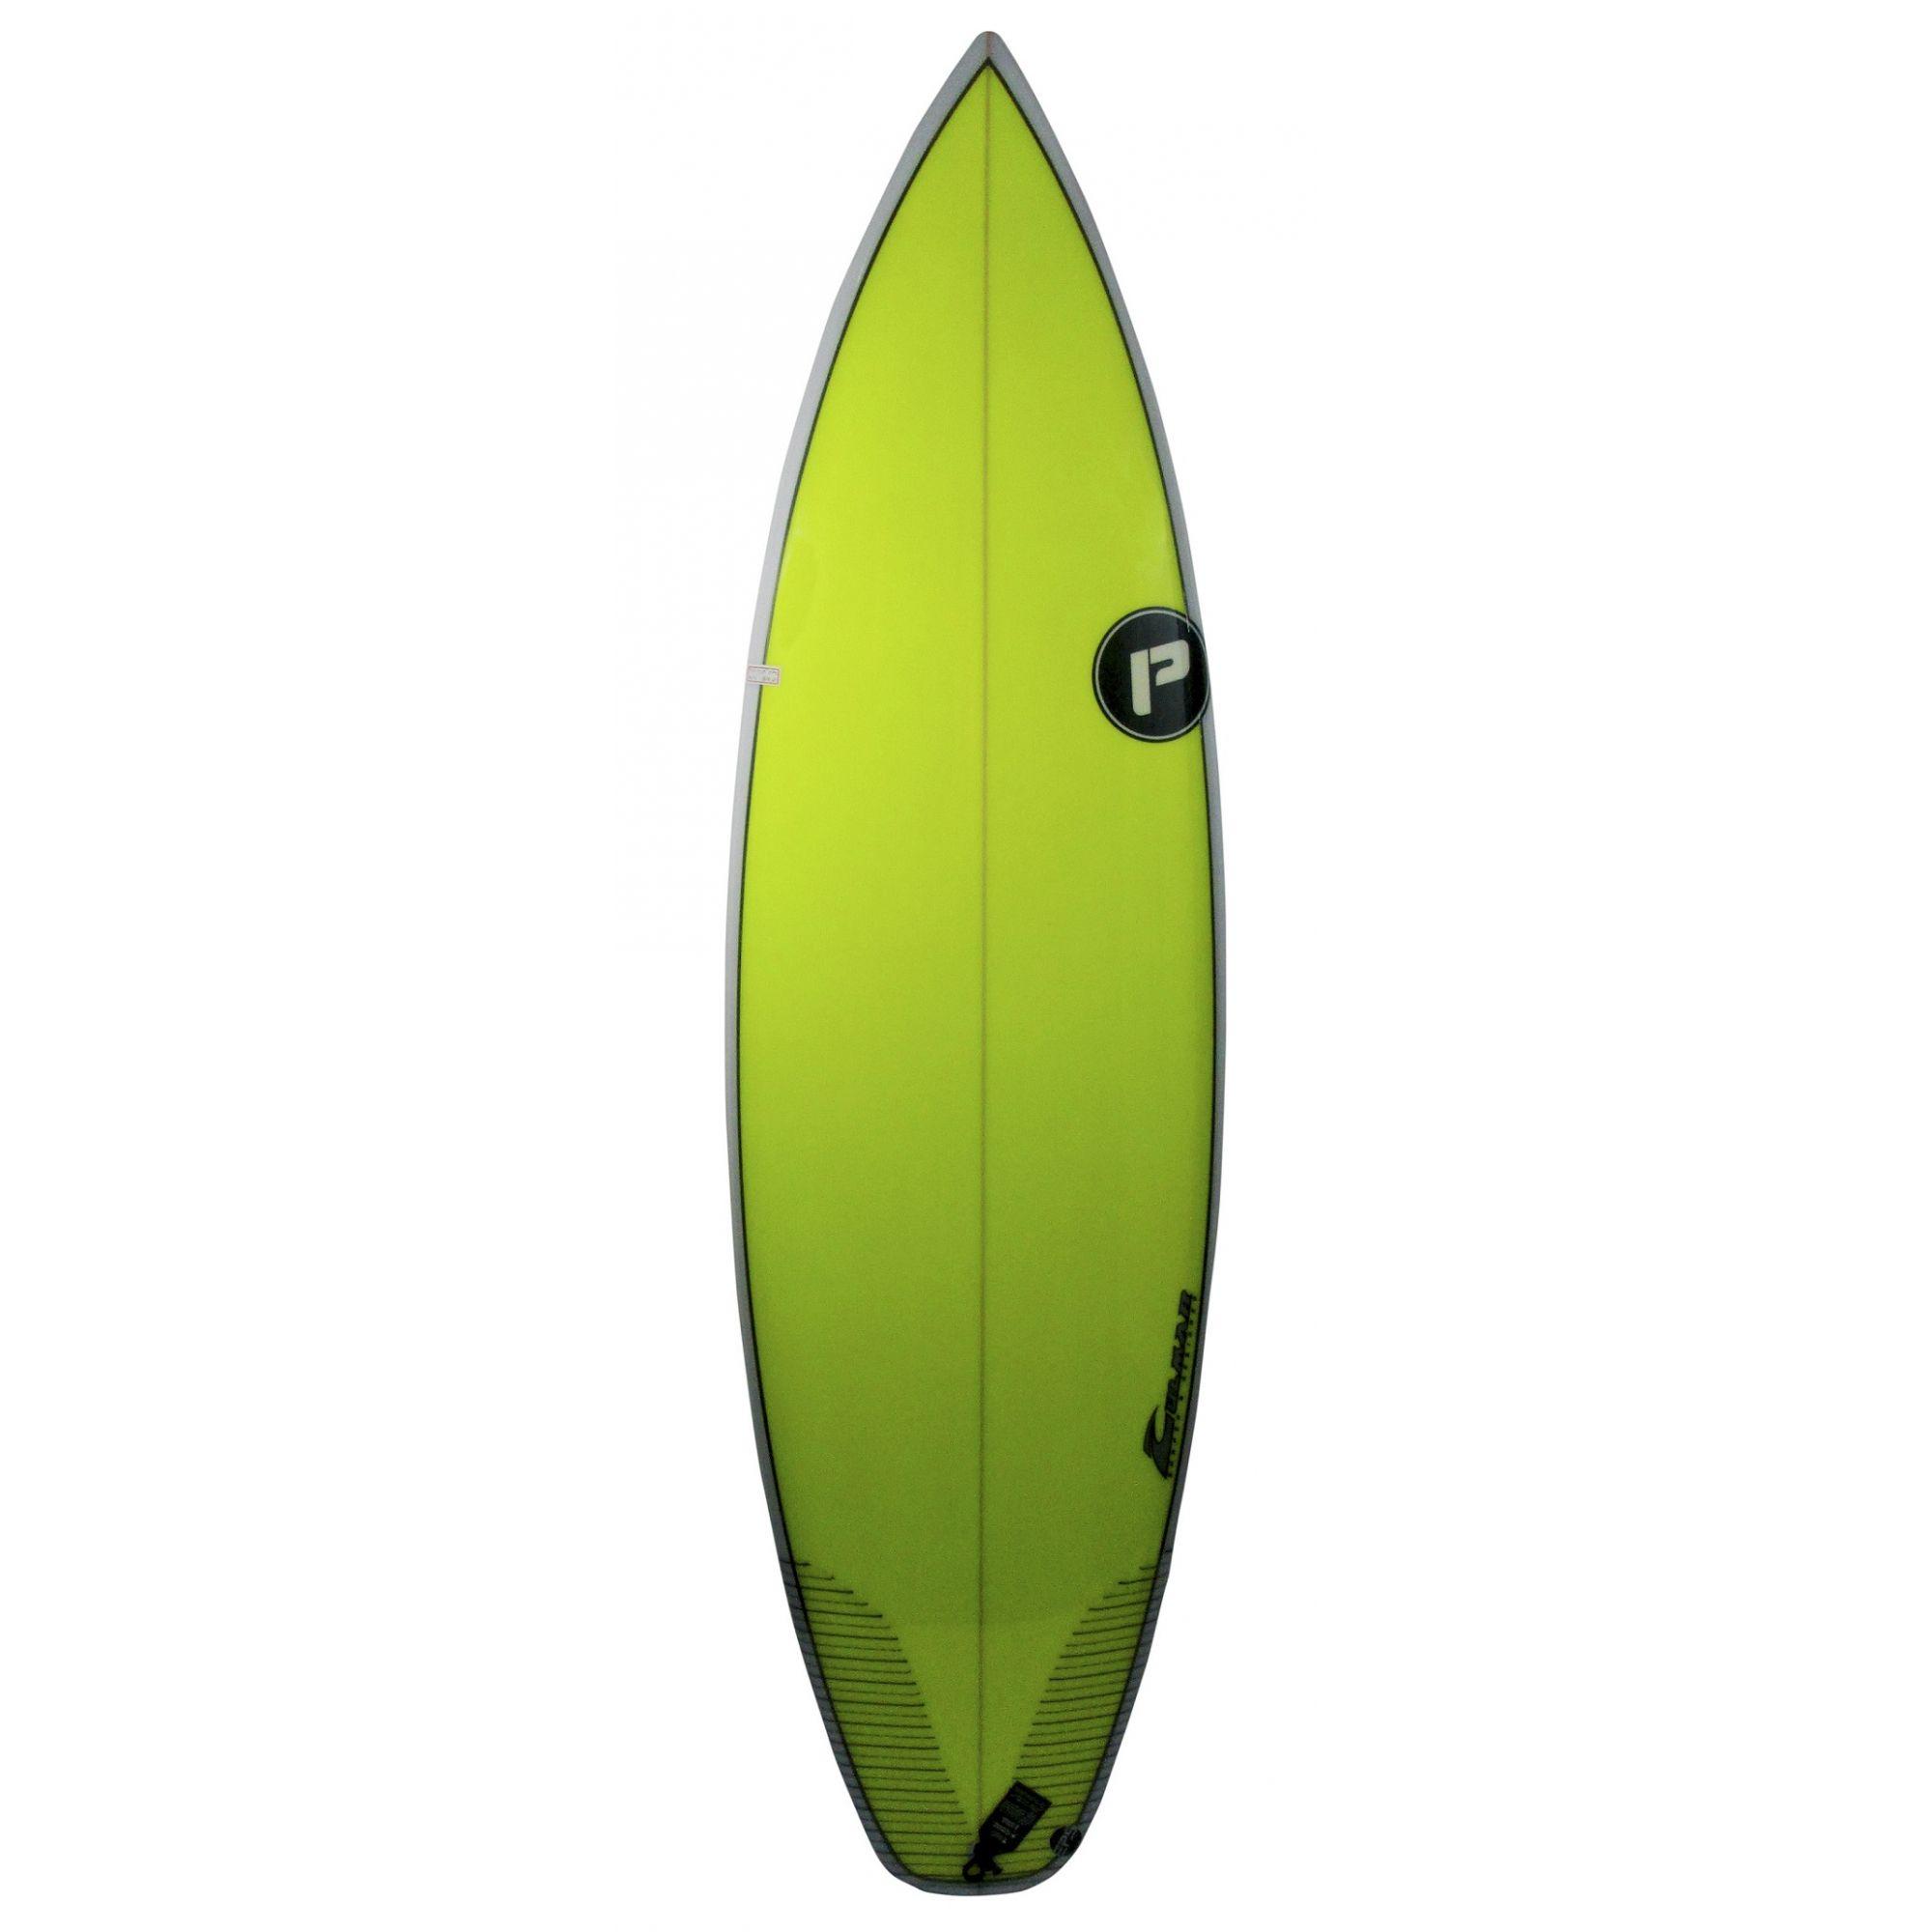 Prancha de Surf Pro Ilha Z Max 3 - 5´11´´ - Epoxi